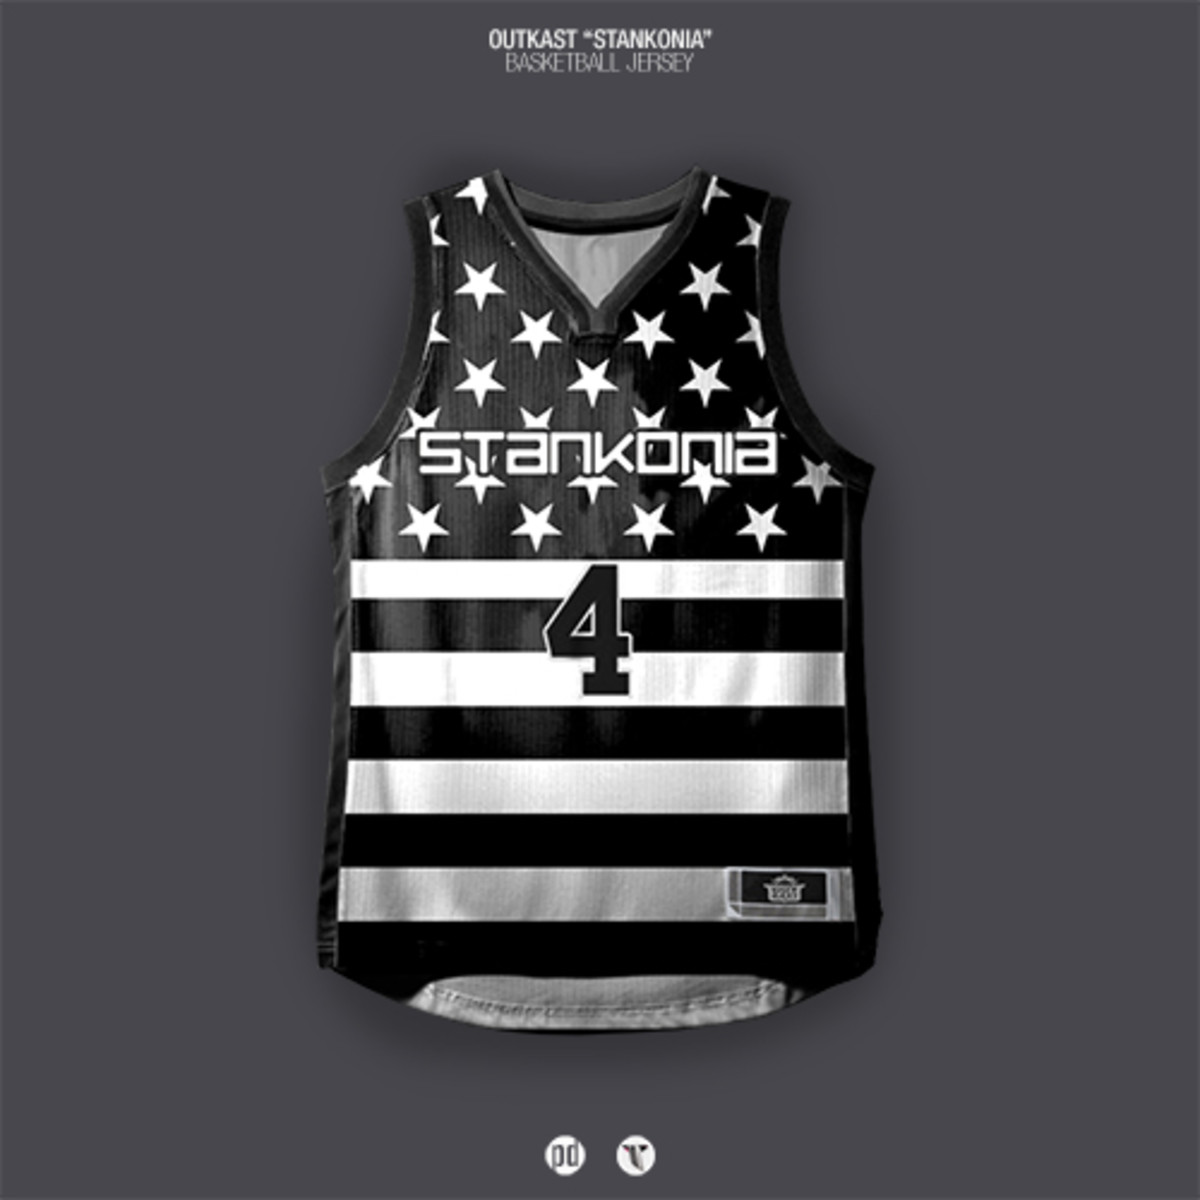 Outkast-Stankonia-basketball-jersey.jpg